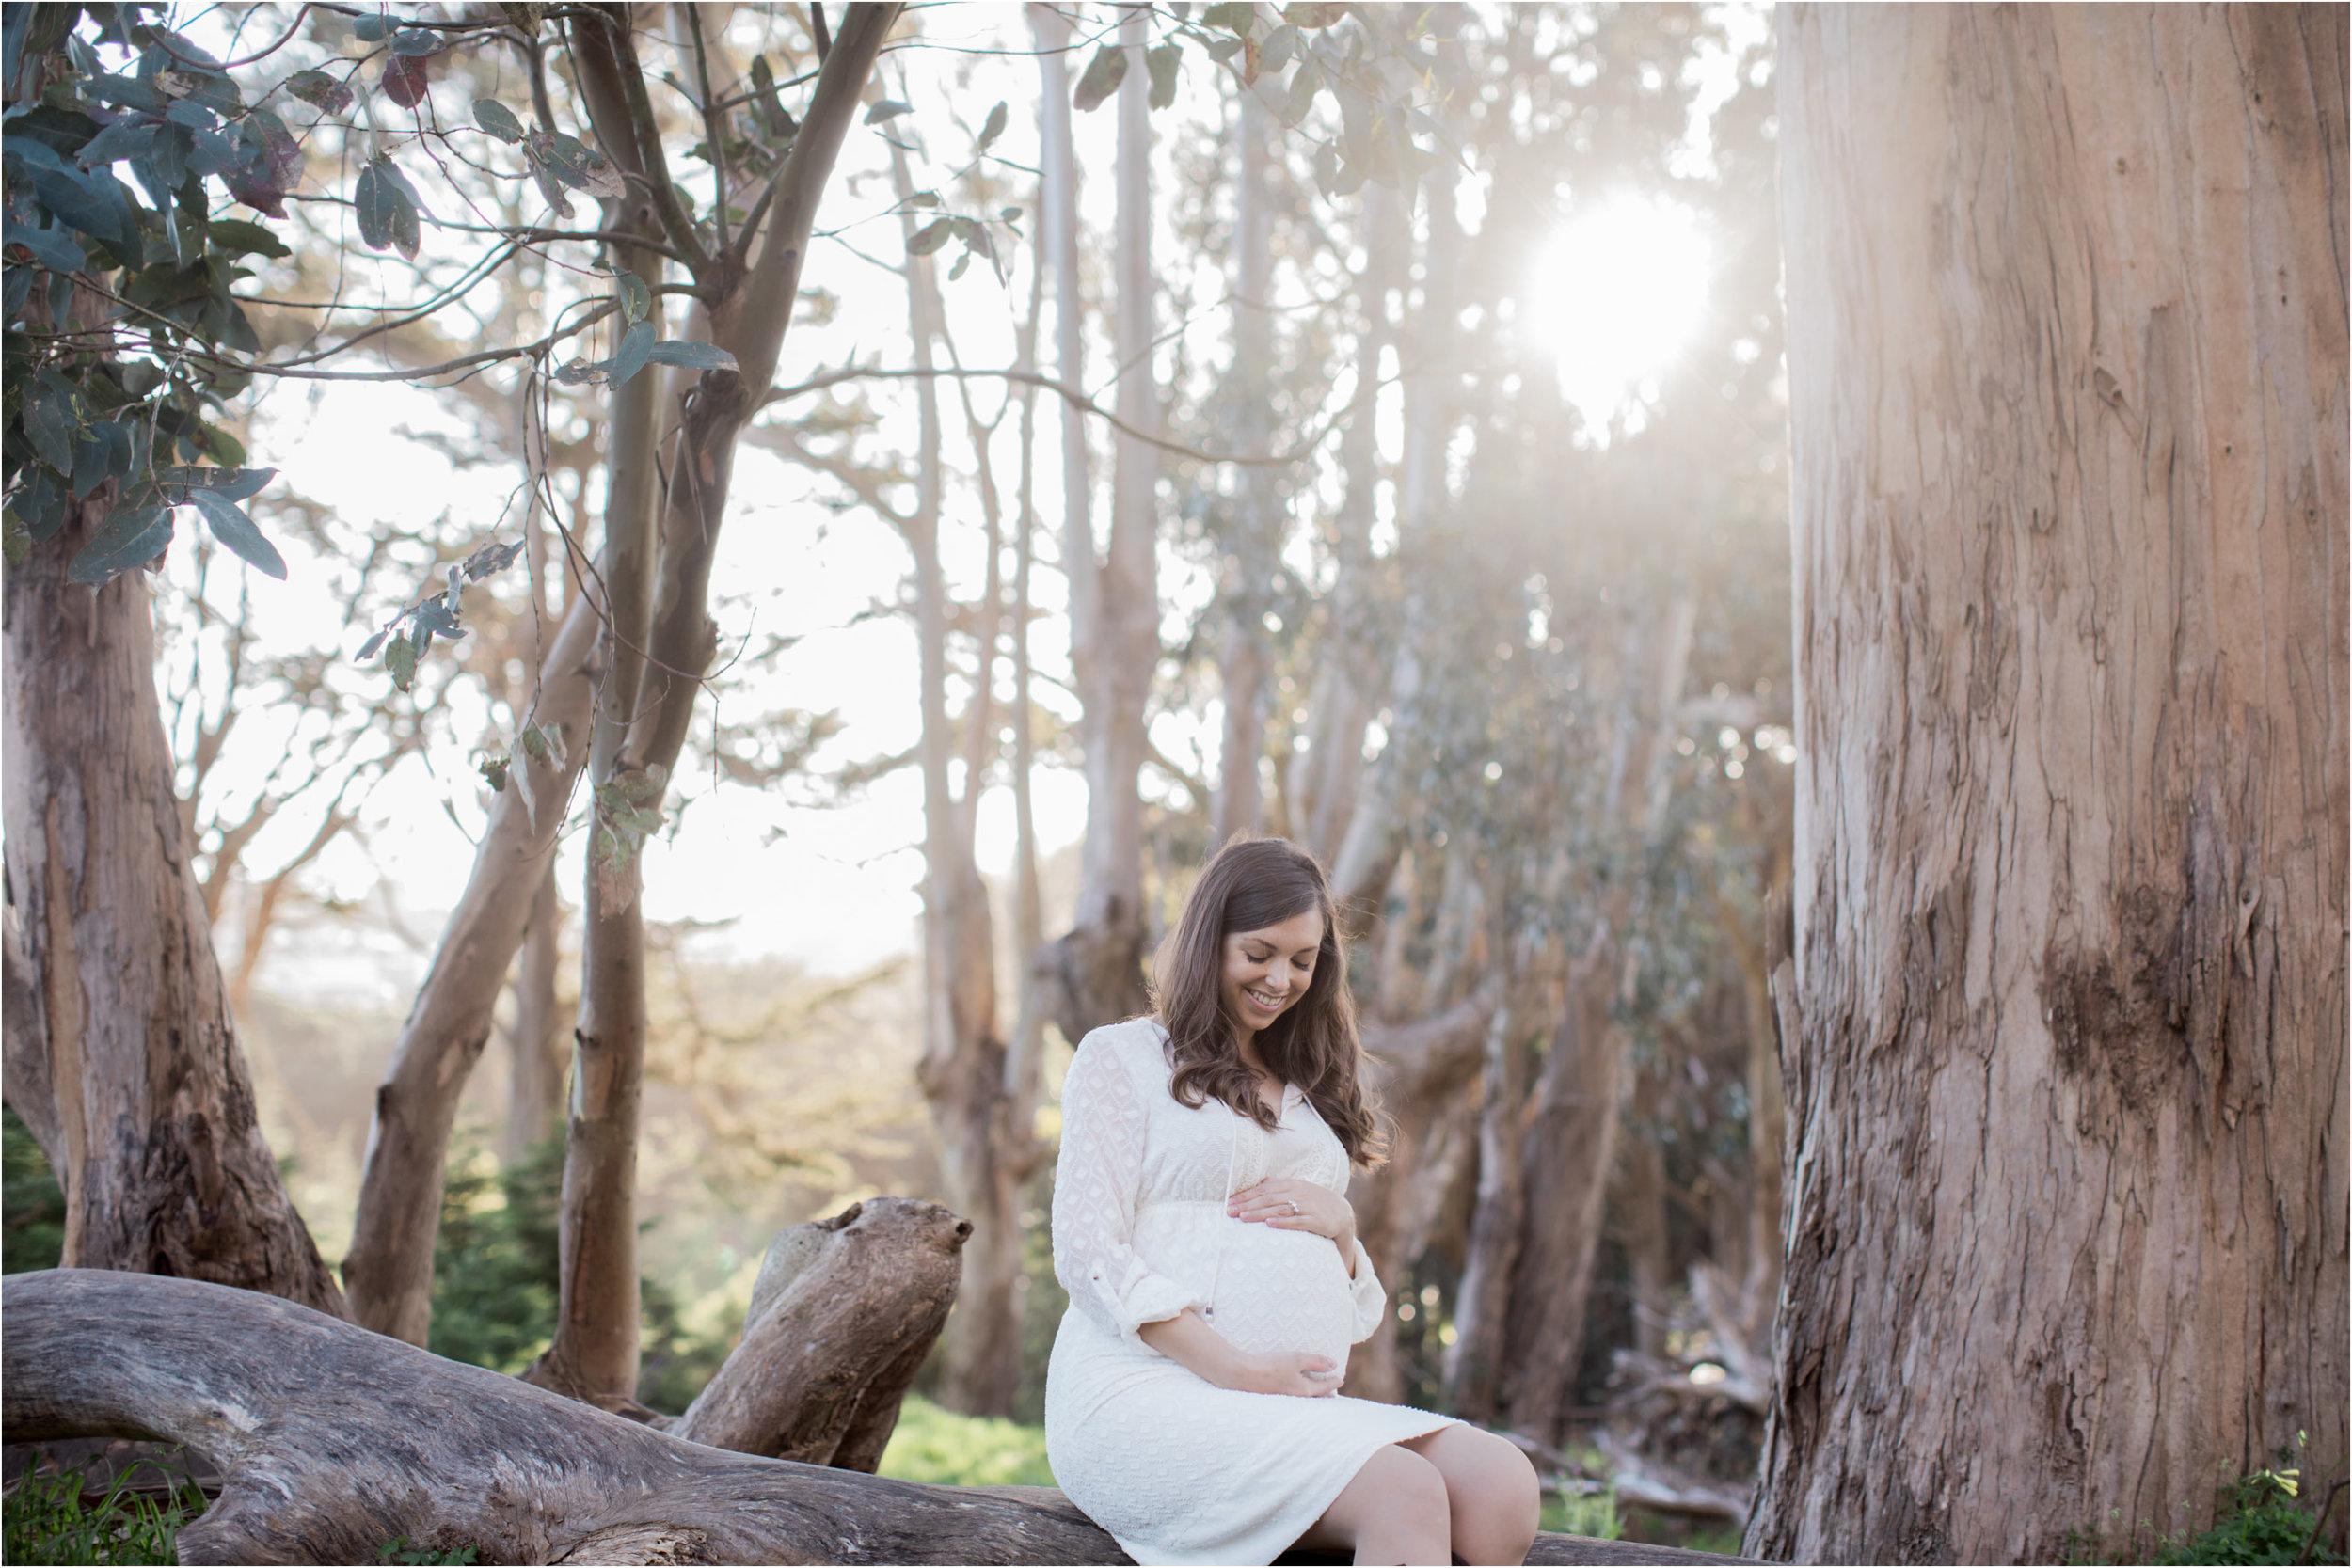 JennaBethPhotography-OhMaternity-5.jpg